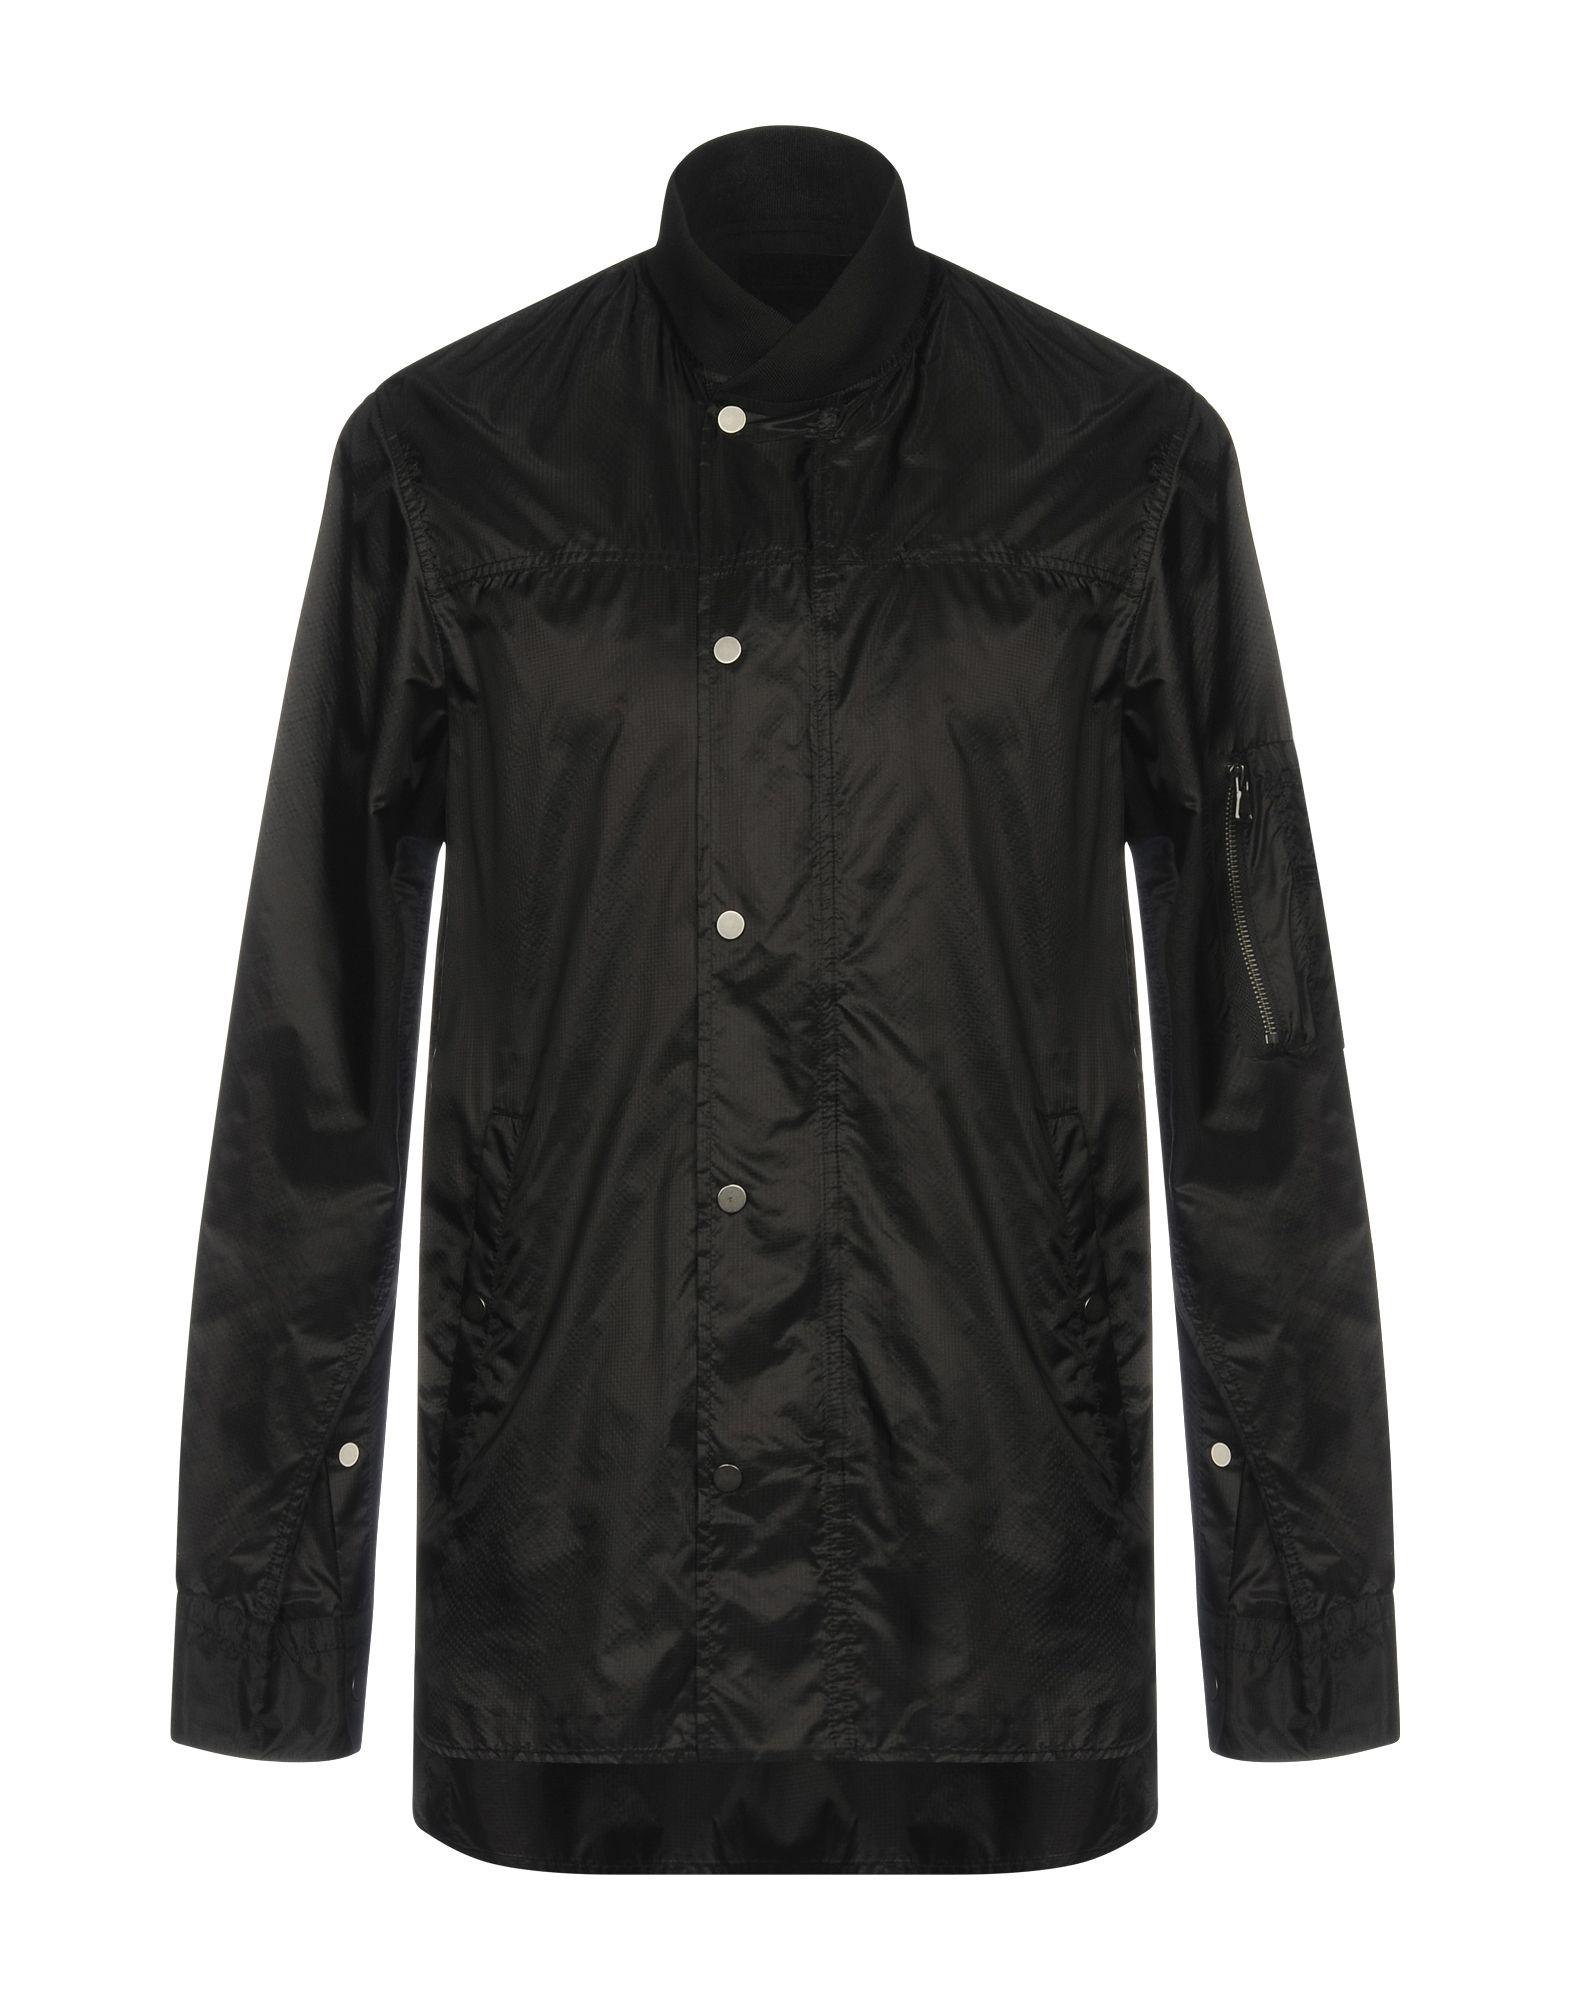 DIESEL BLACK GOLD Куртка diesel black gold укороченная куртка со смещенной молнией